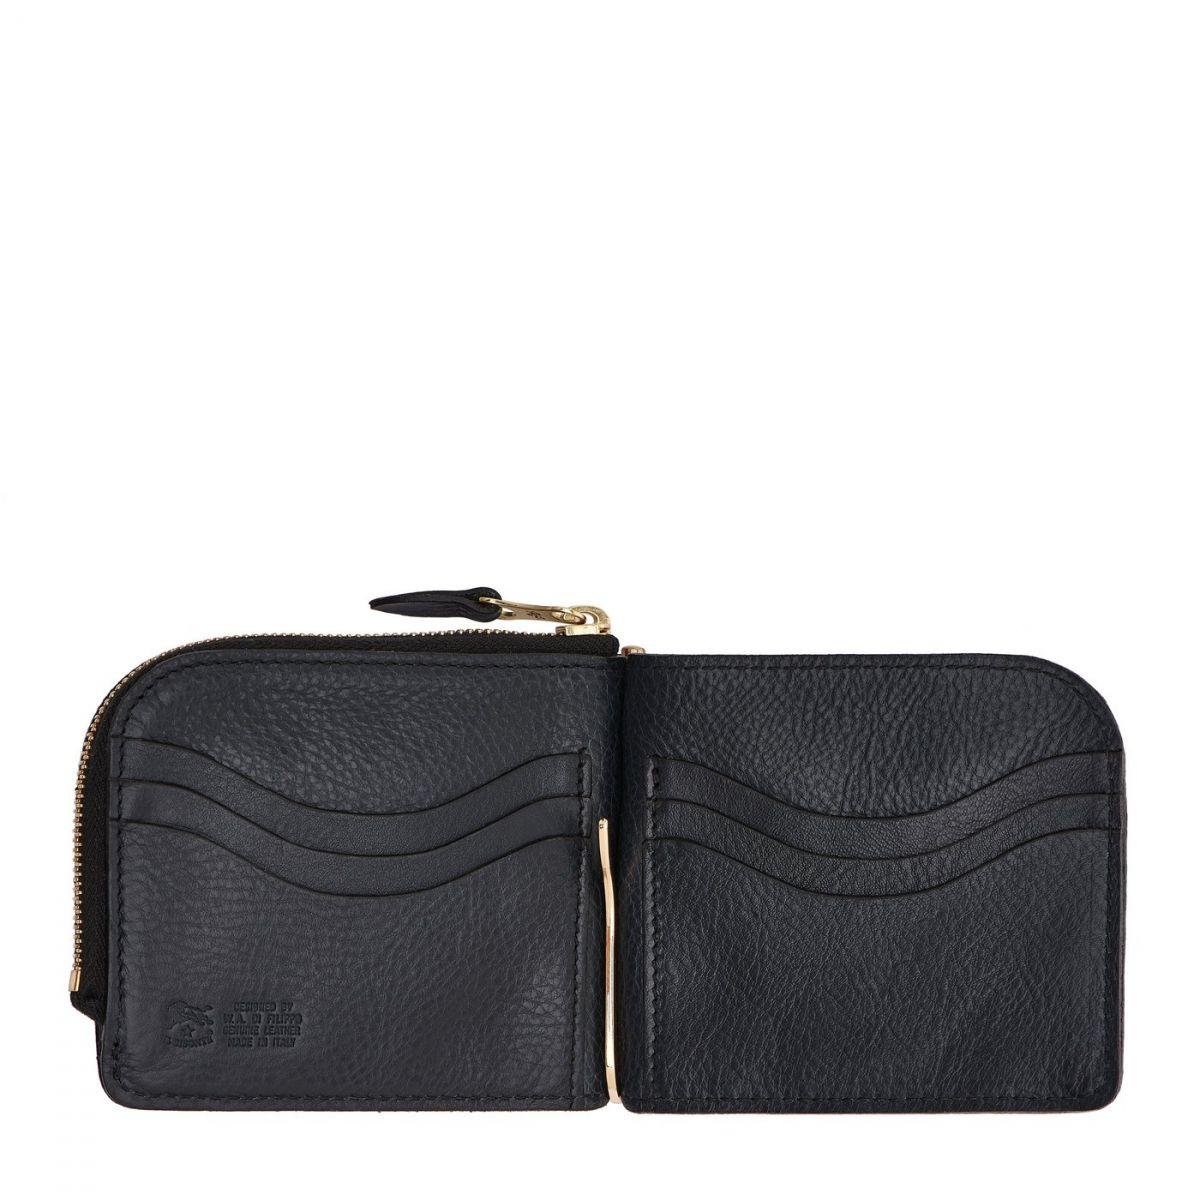 Men's Wallet in Cowhide Double Leather color Blue - SMW077 | Details